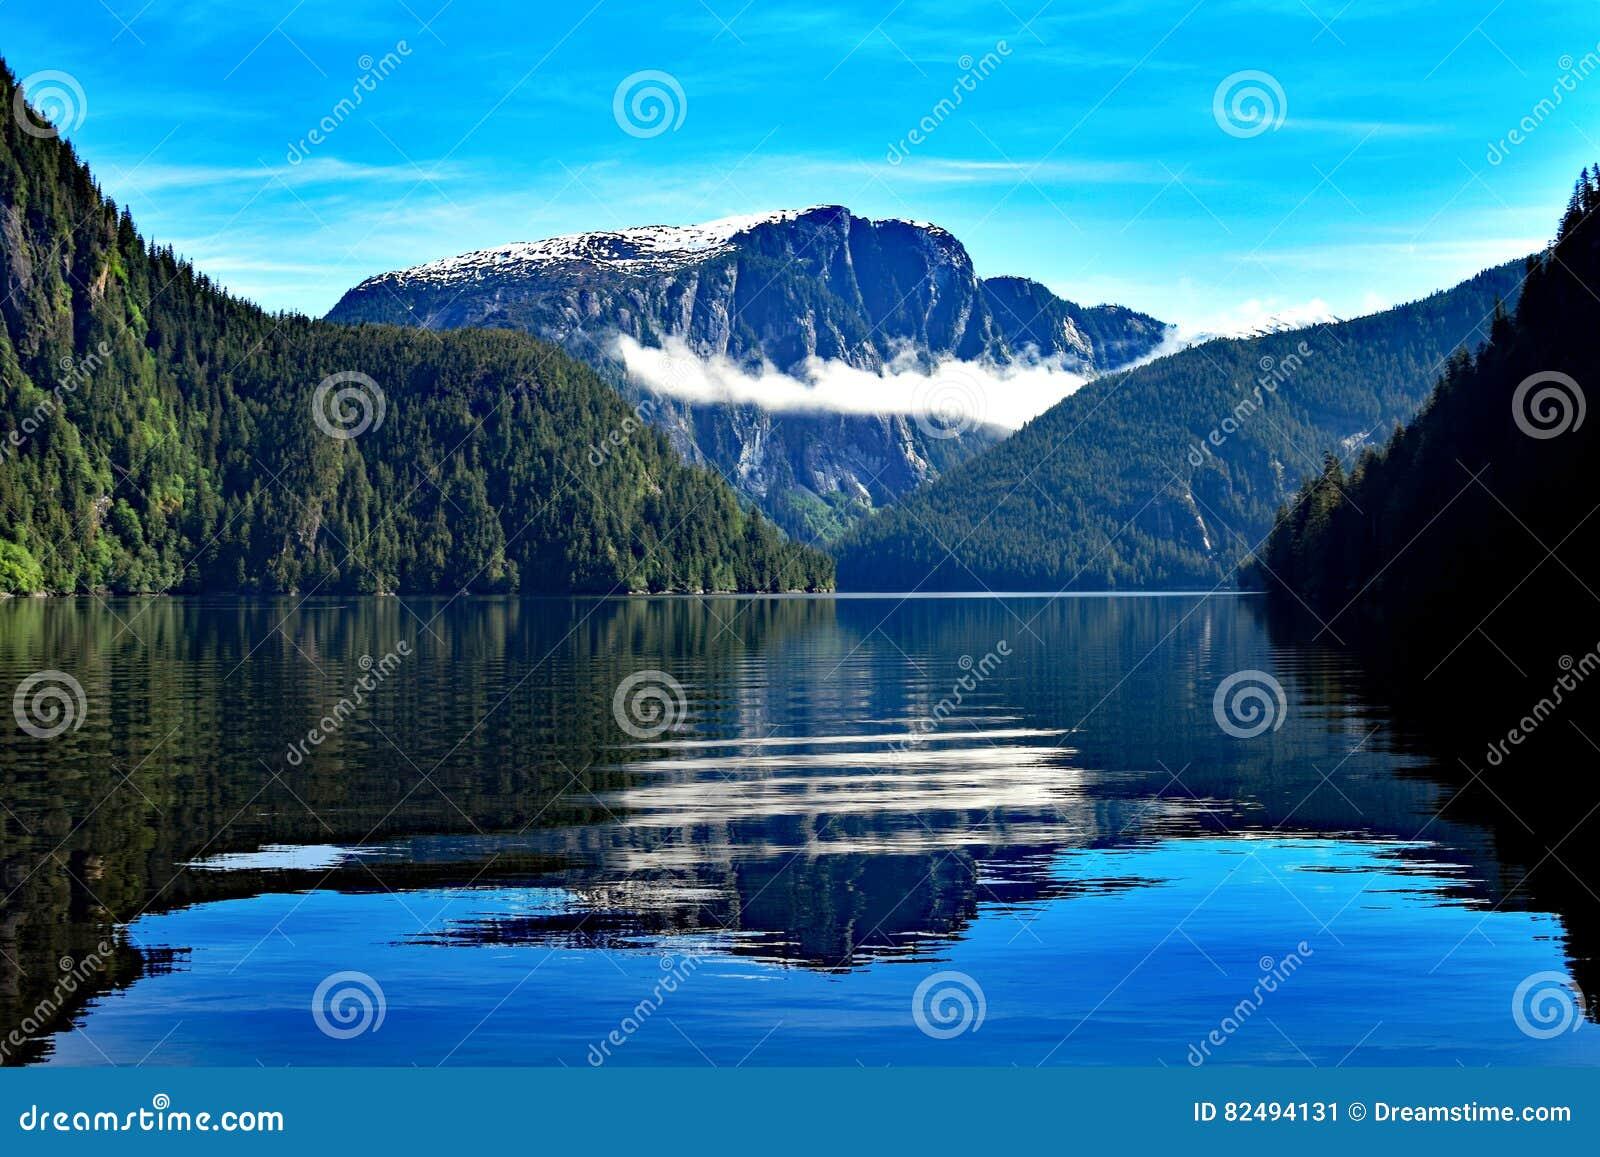 Misty Fjords Reflections